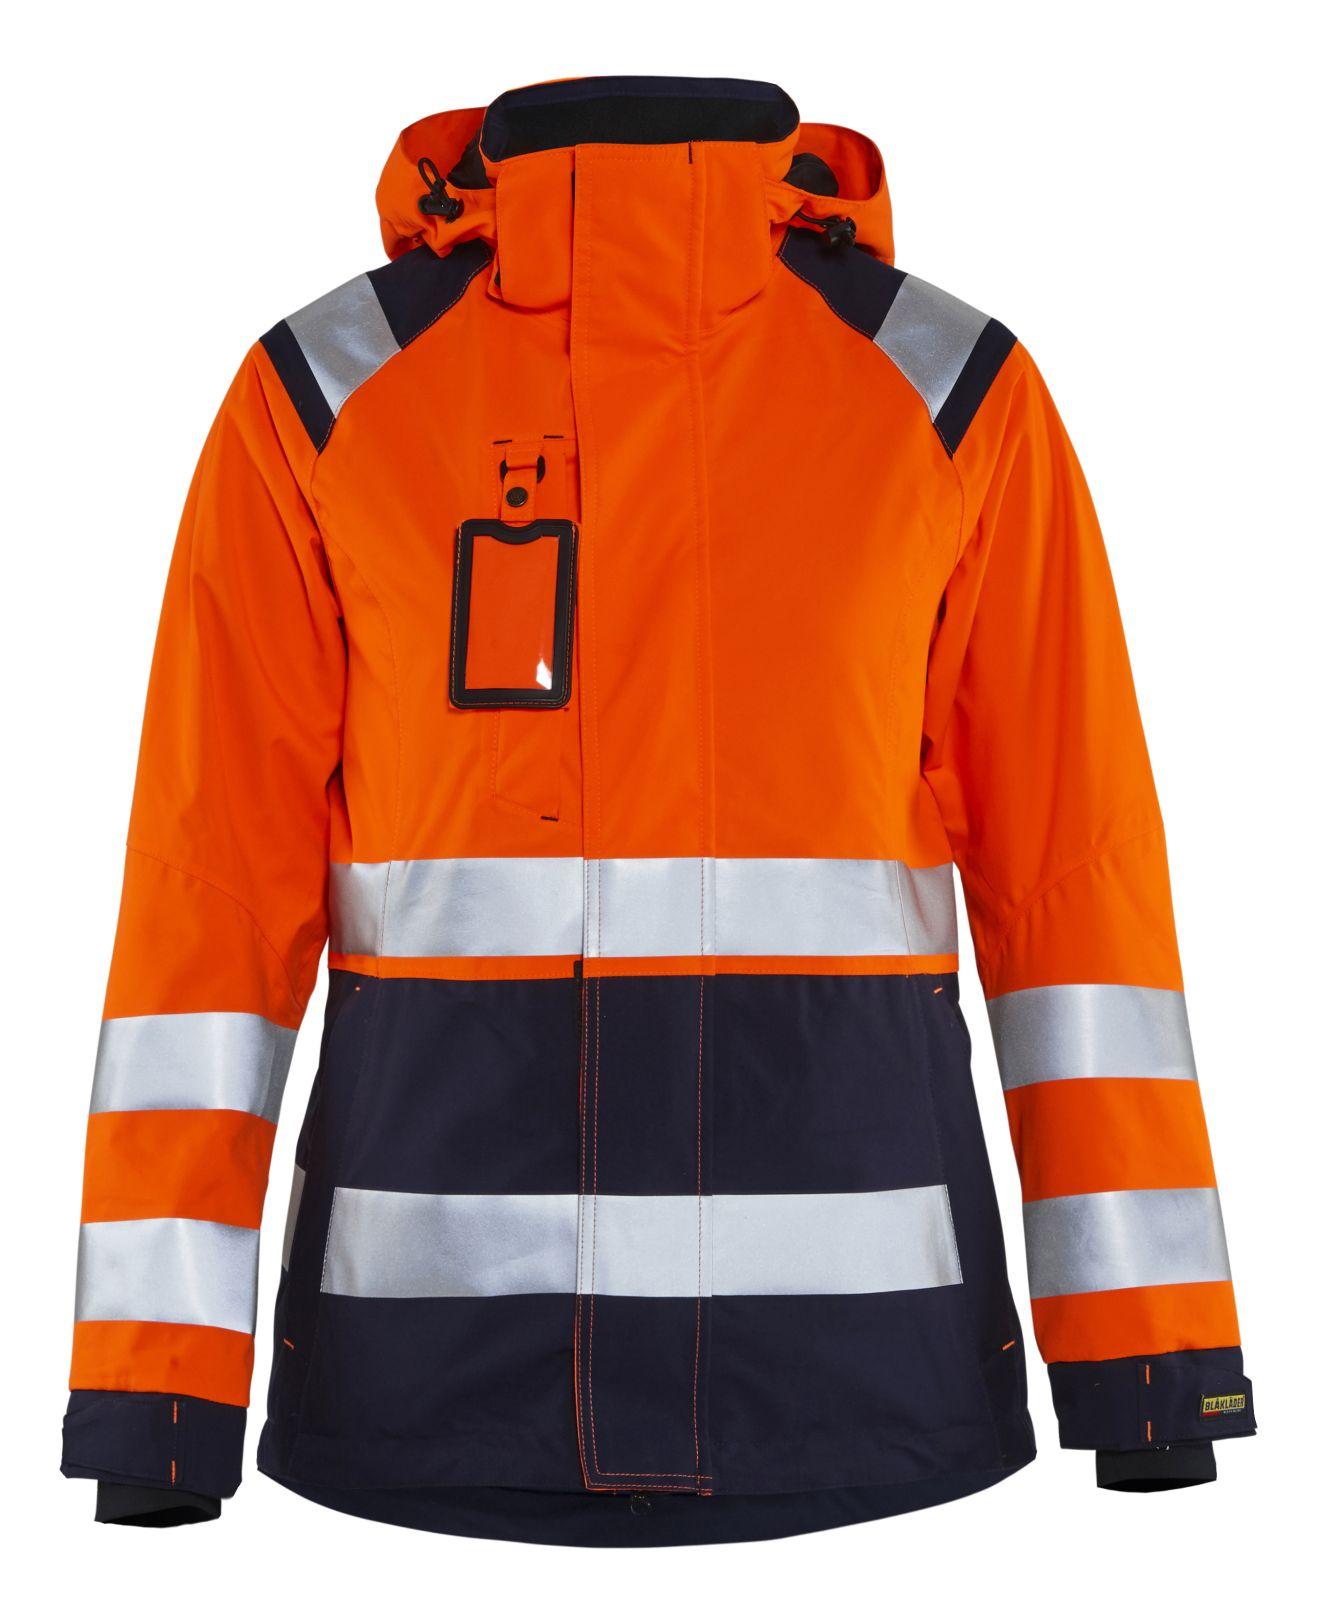 Blaklader Dames regenjacks 49041987 High Vis oranje-marineblauw(5389)